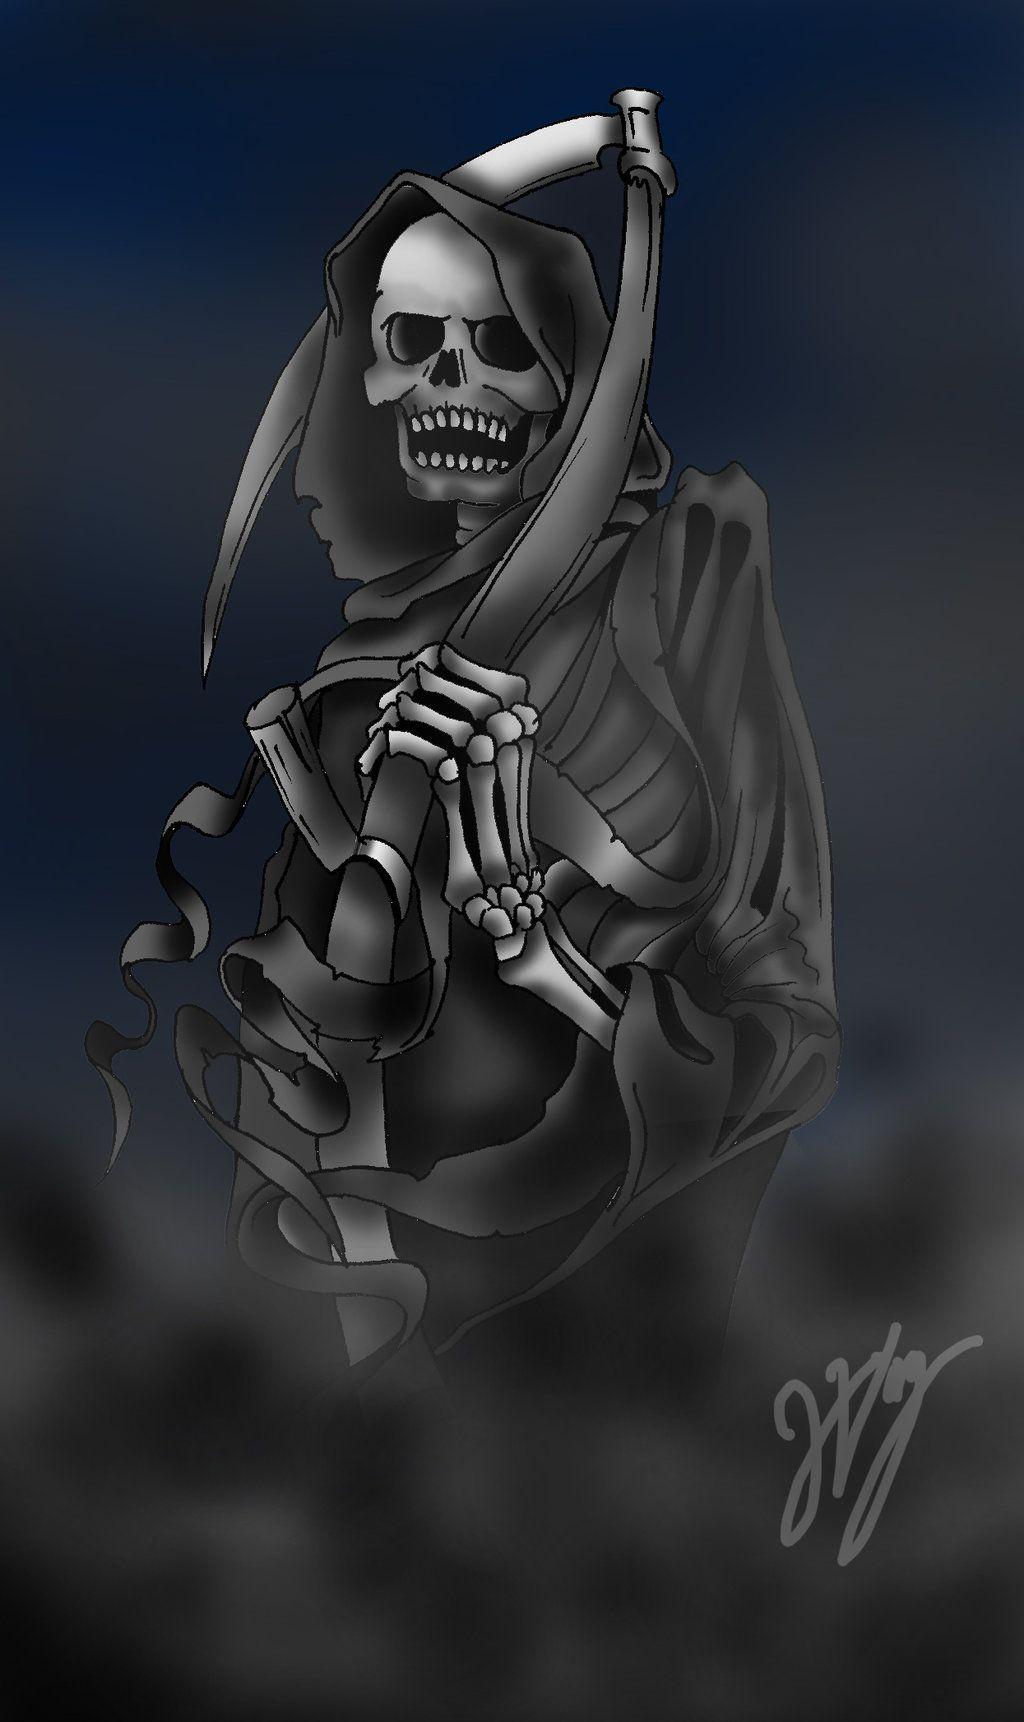 Sara Swirl meets dark Reaper